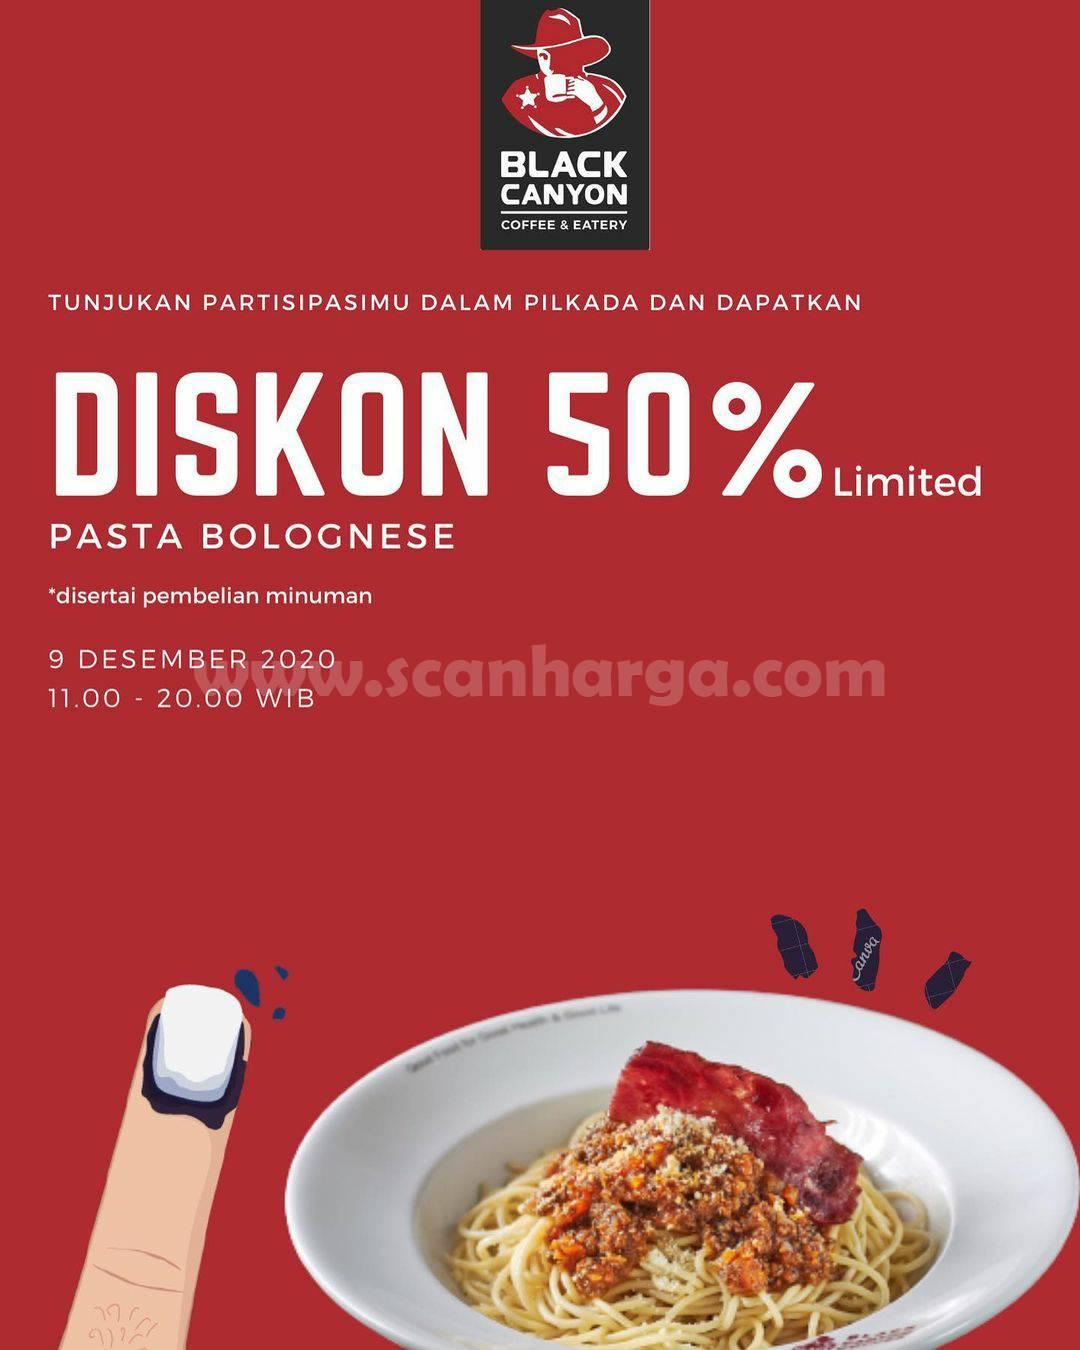 Promo Black Canyon Surabaya Pilkada - Diskon 50% pembelian Pasta Bolognese